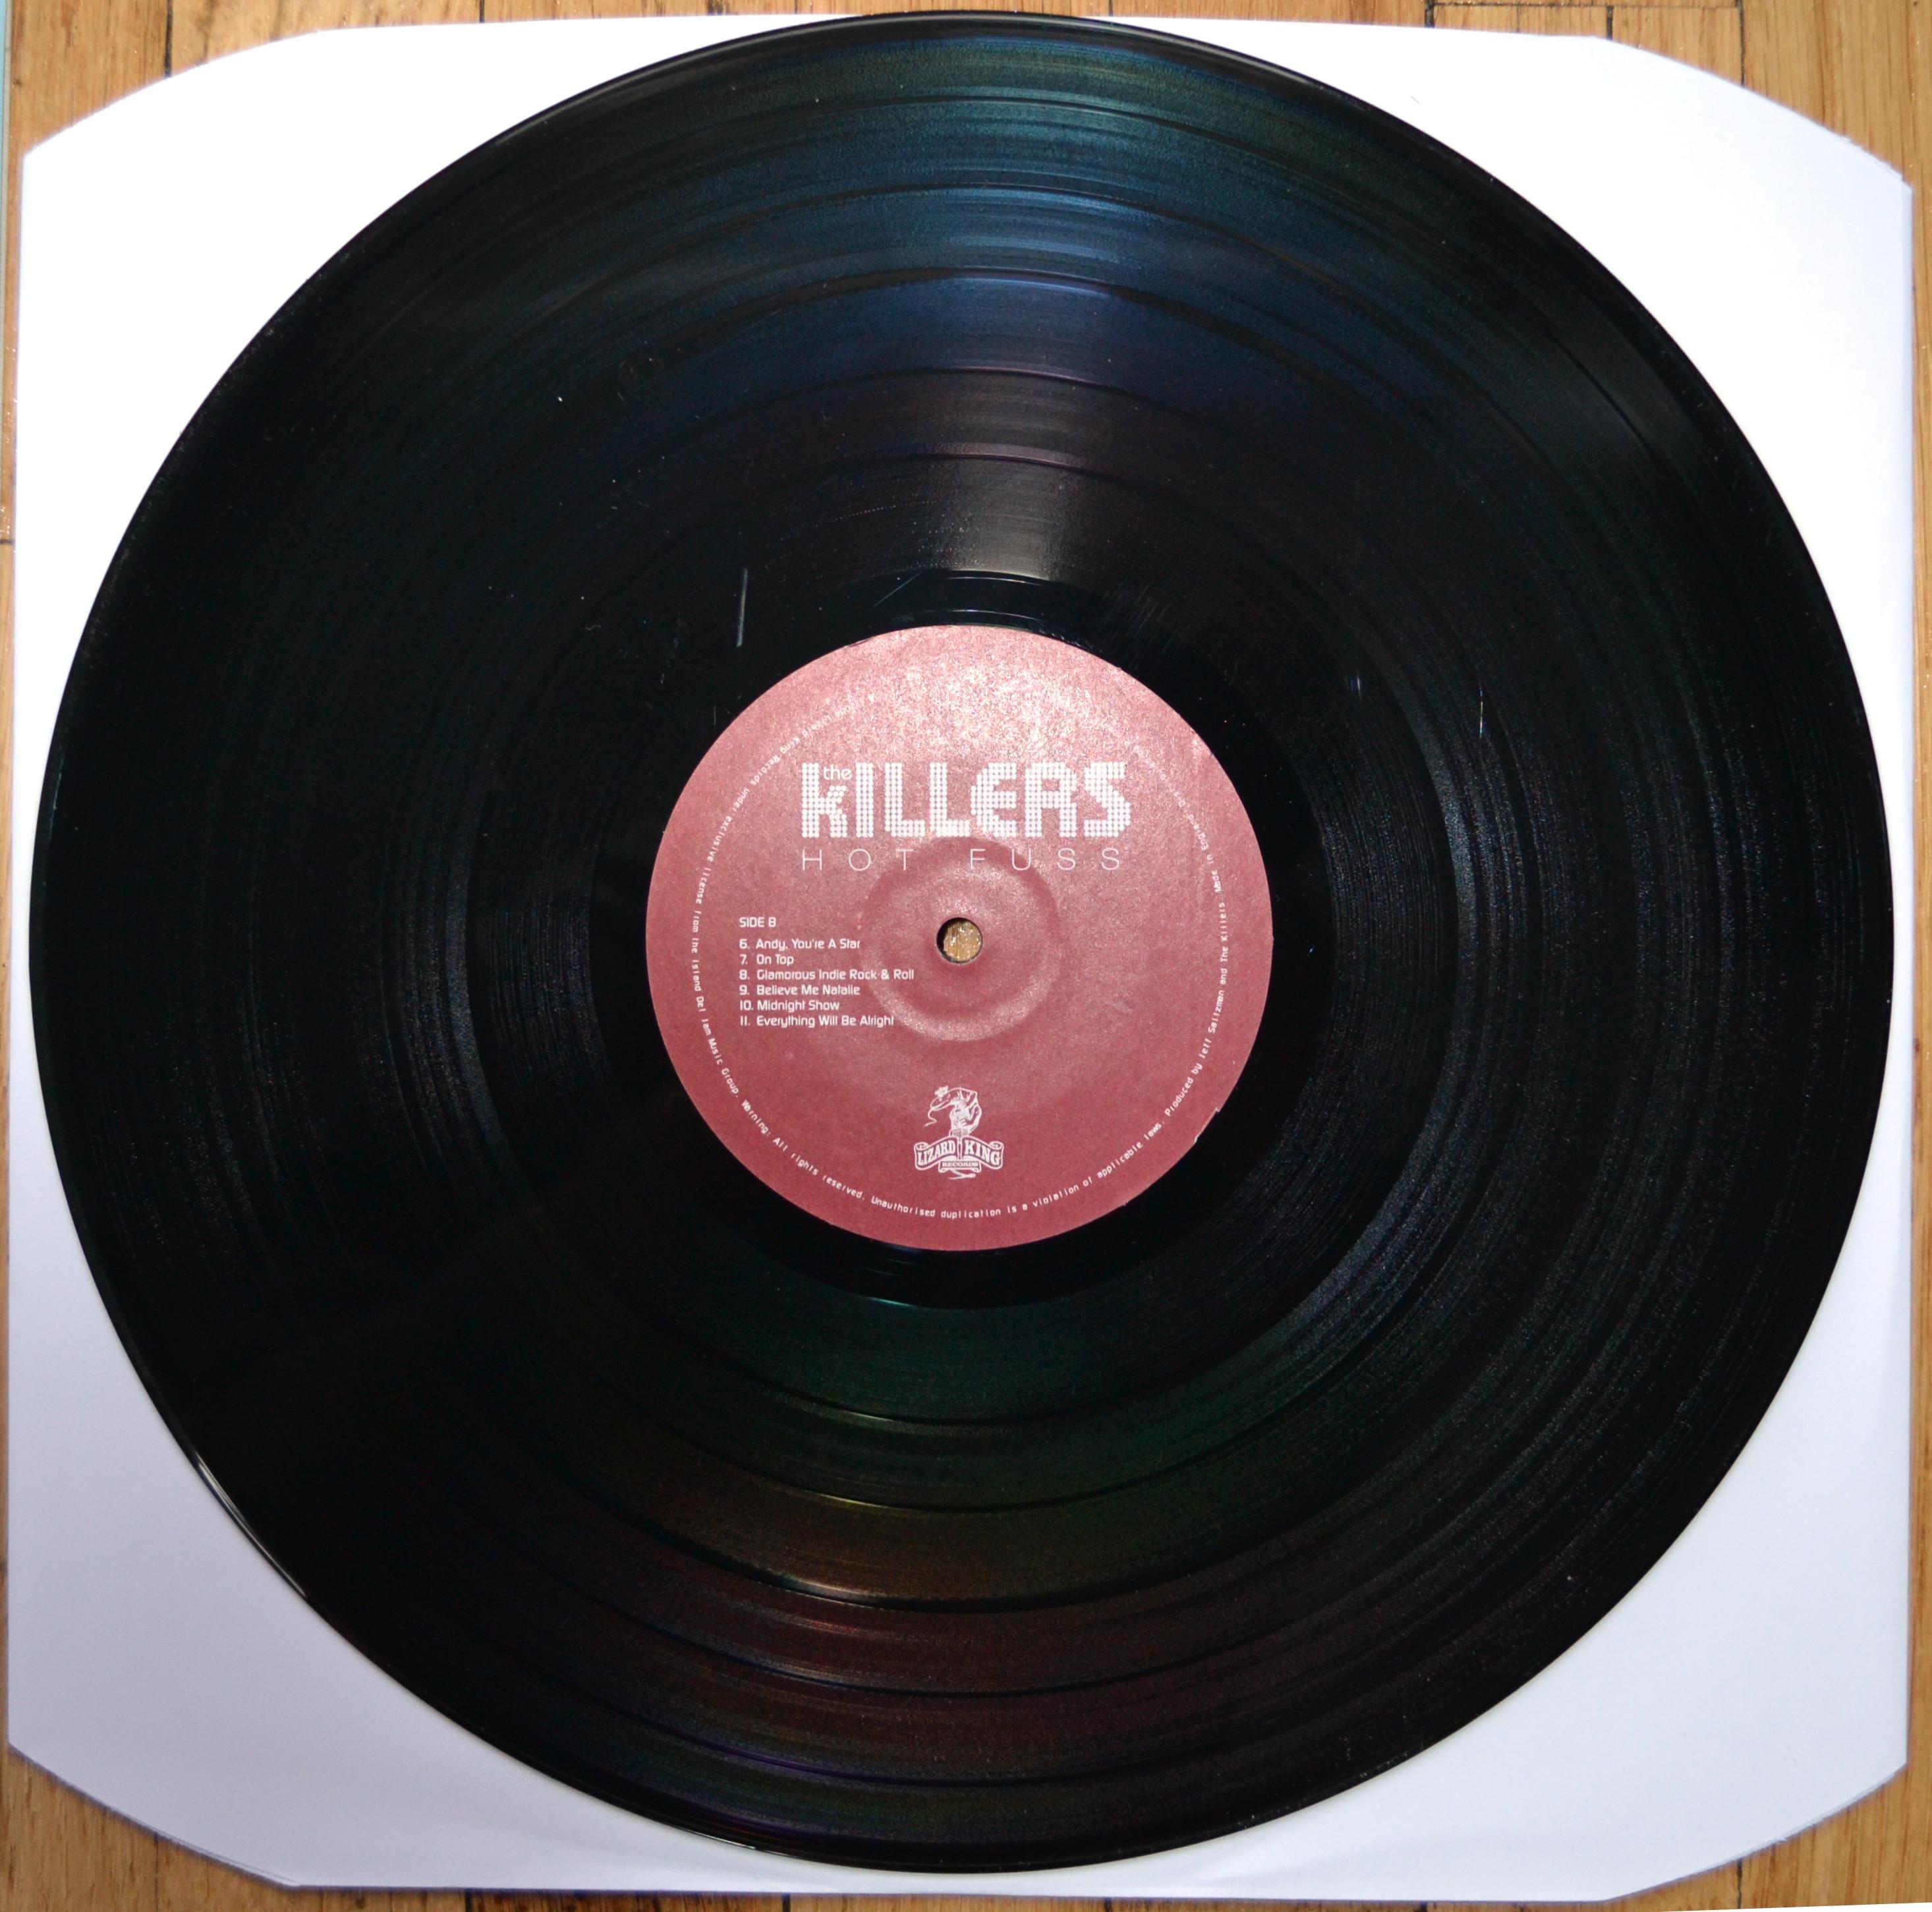 Killers Hot Fuss Vinyl Lp 183 Revealed Records 183 Online